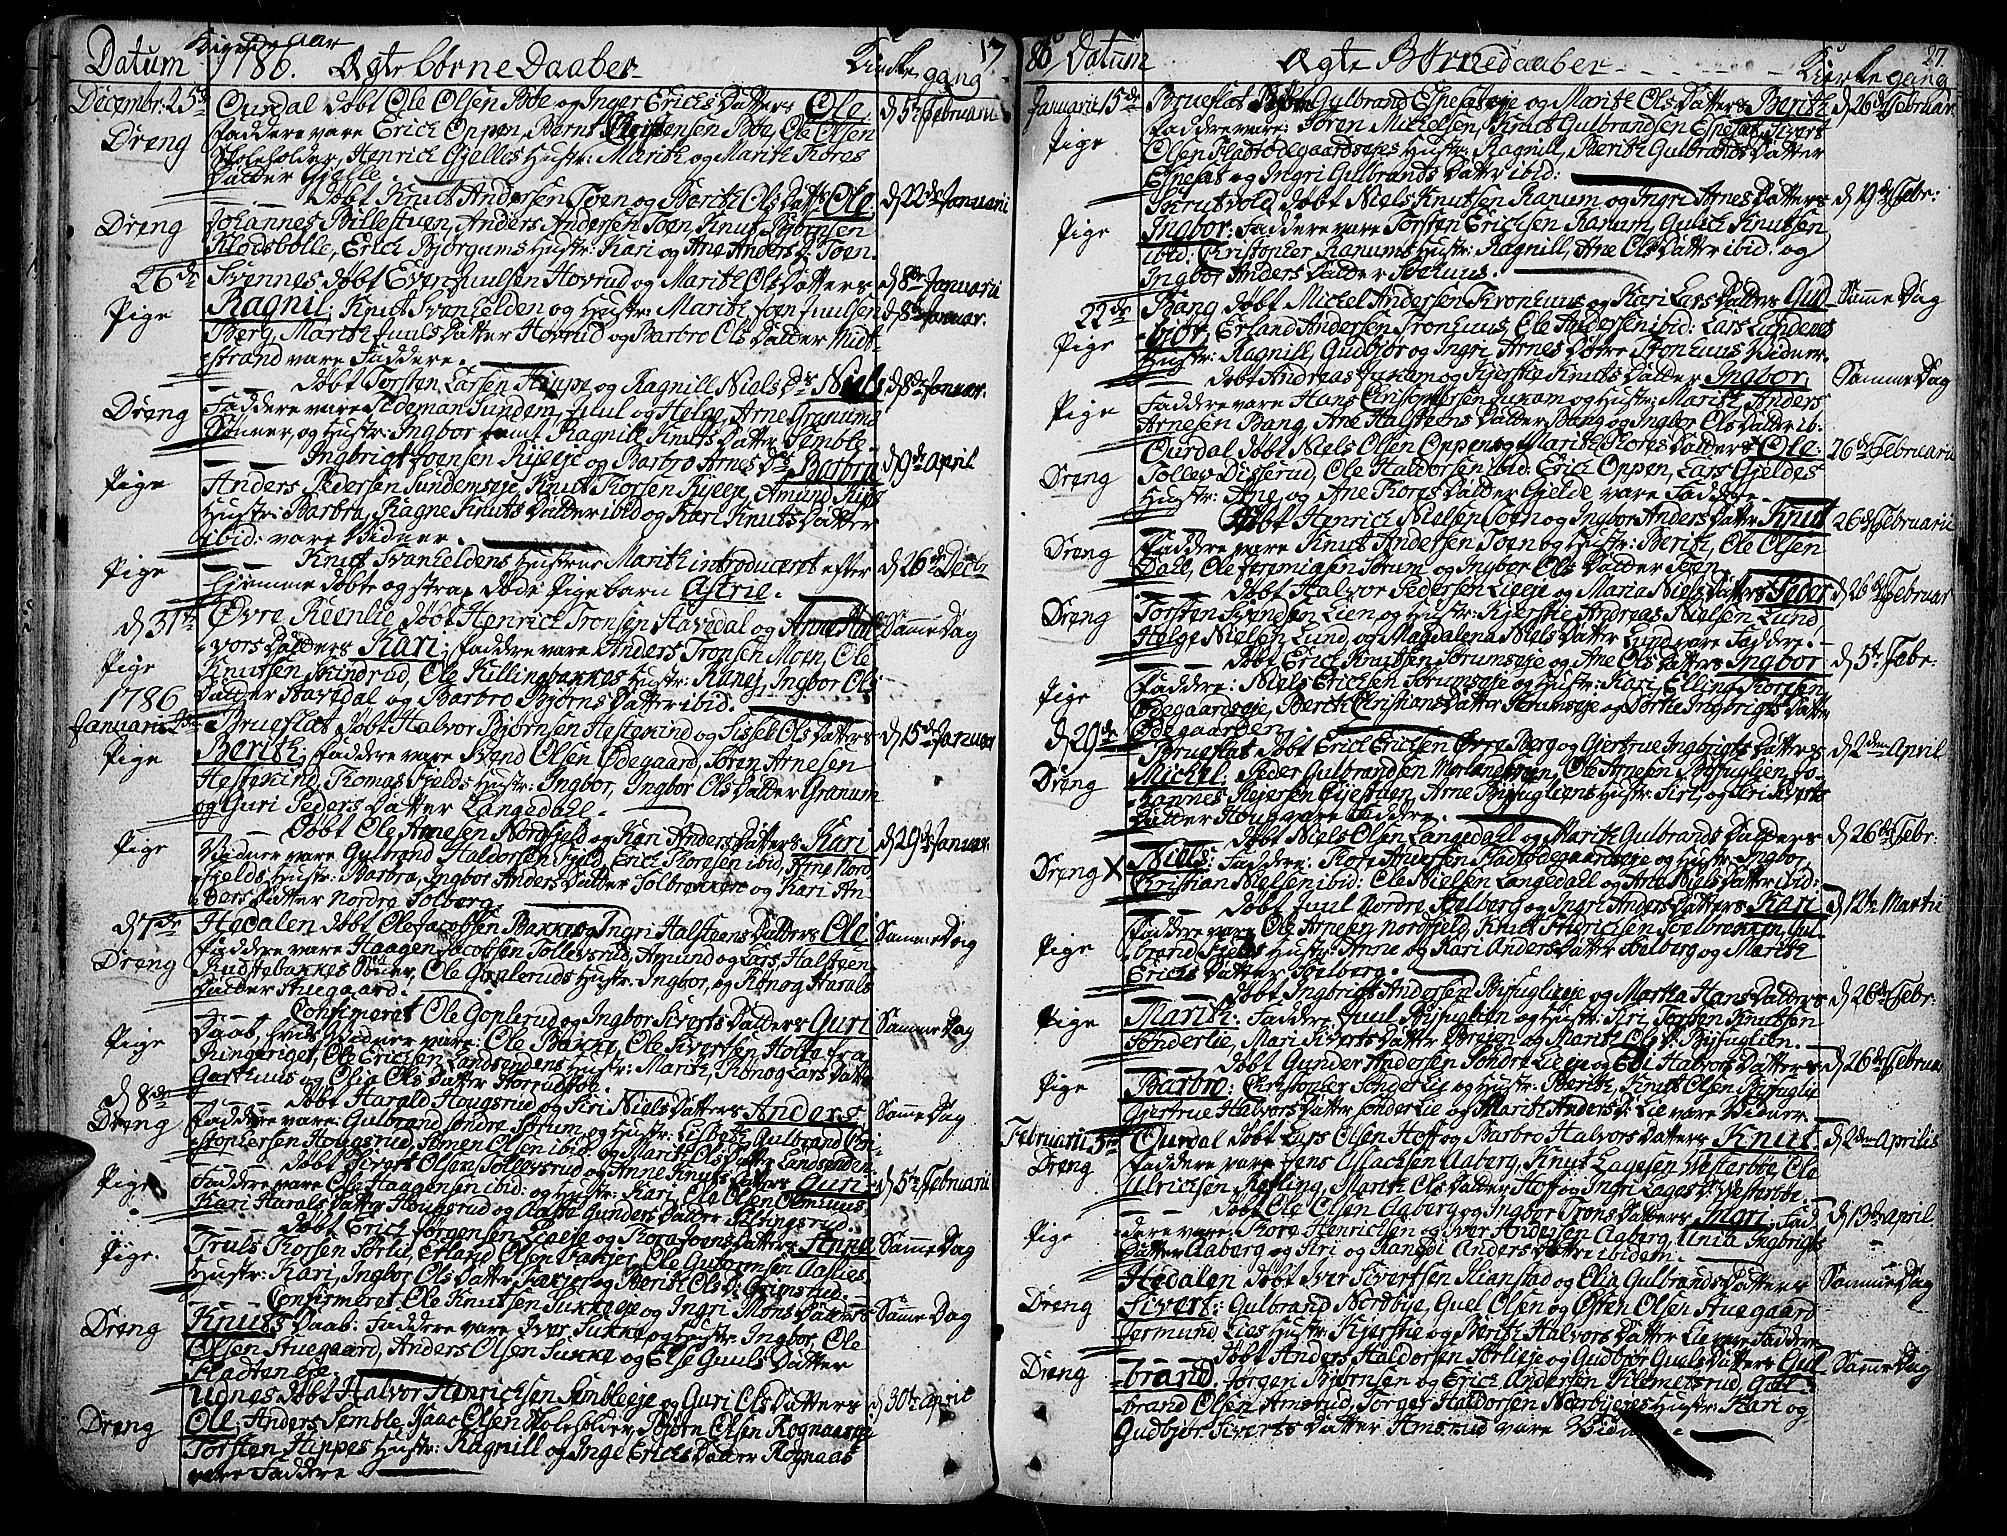 SAH, Aurdal prestekontor, Ministerialbok nr. 6, 1781-1804, s. 27